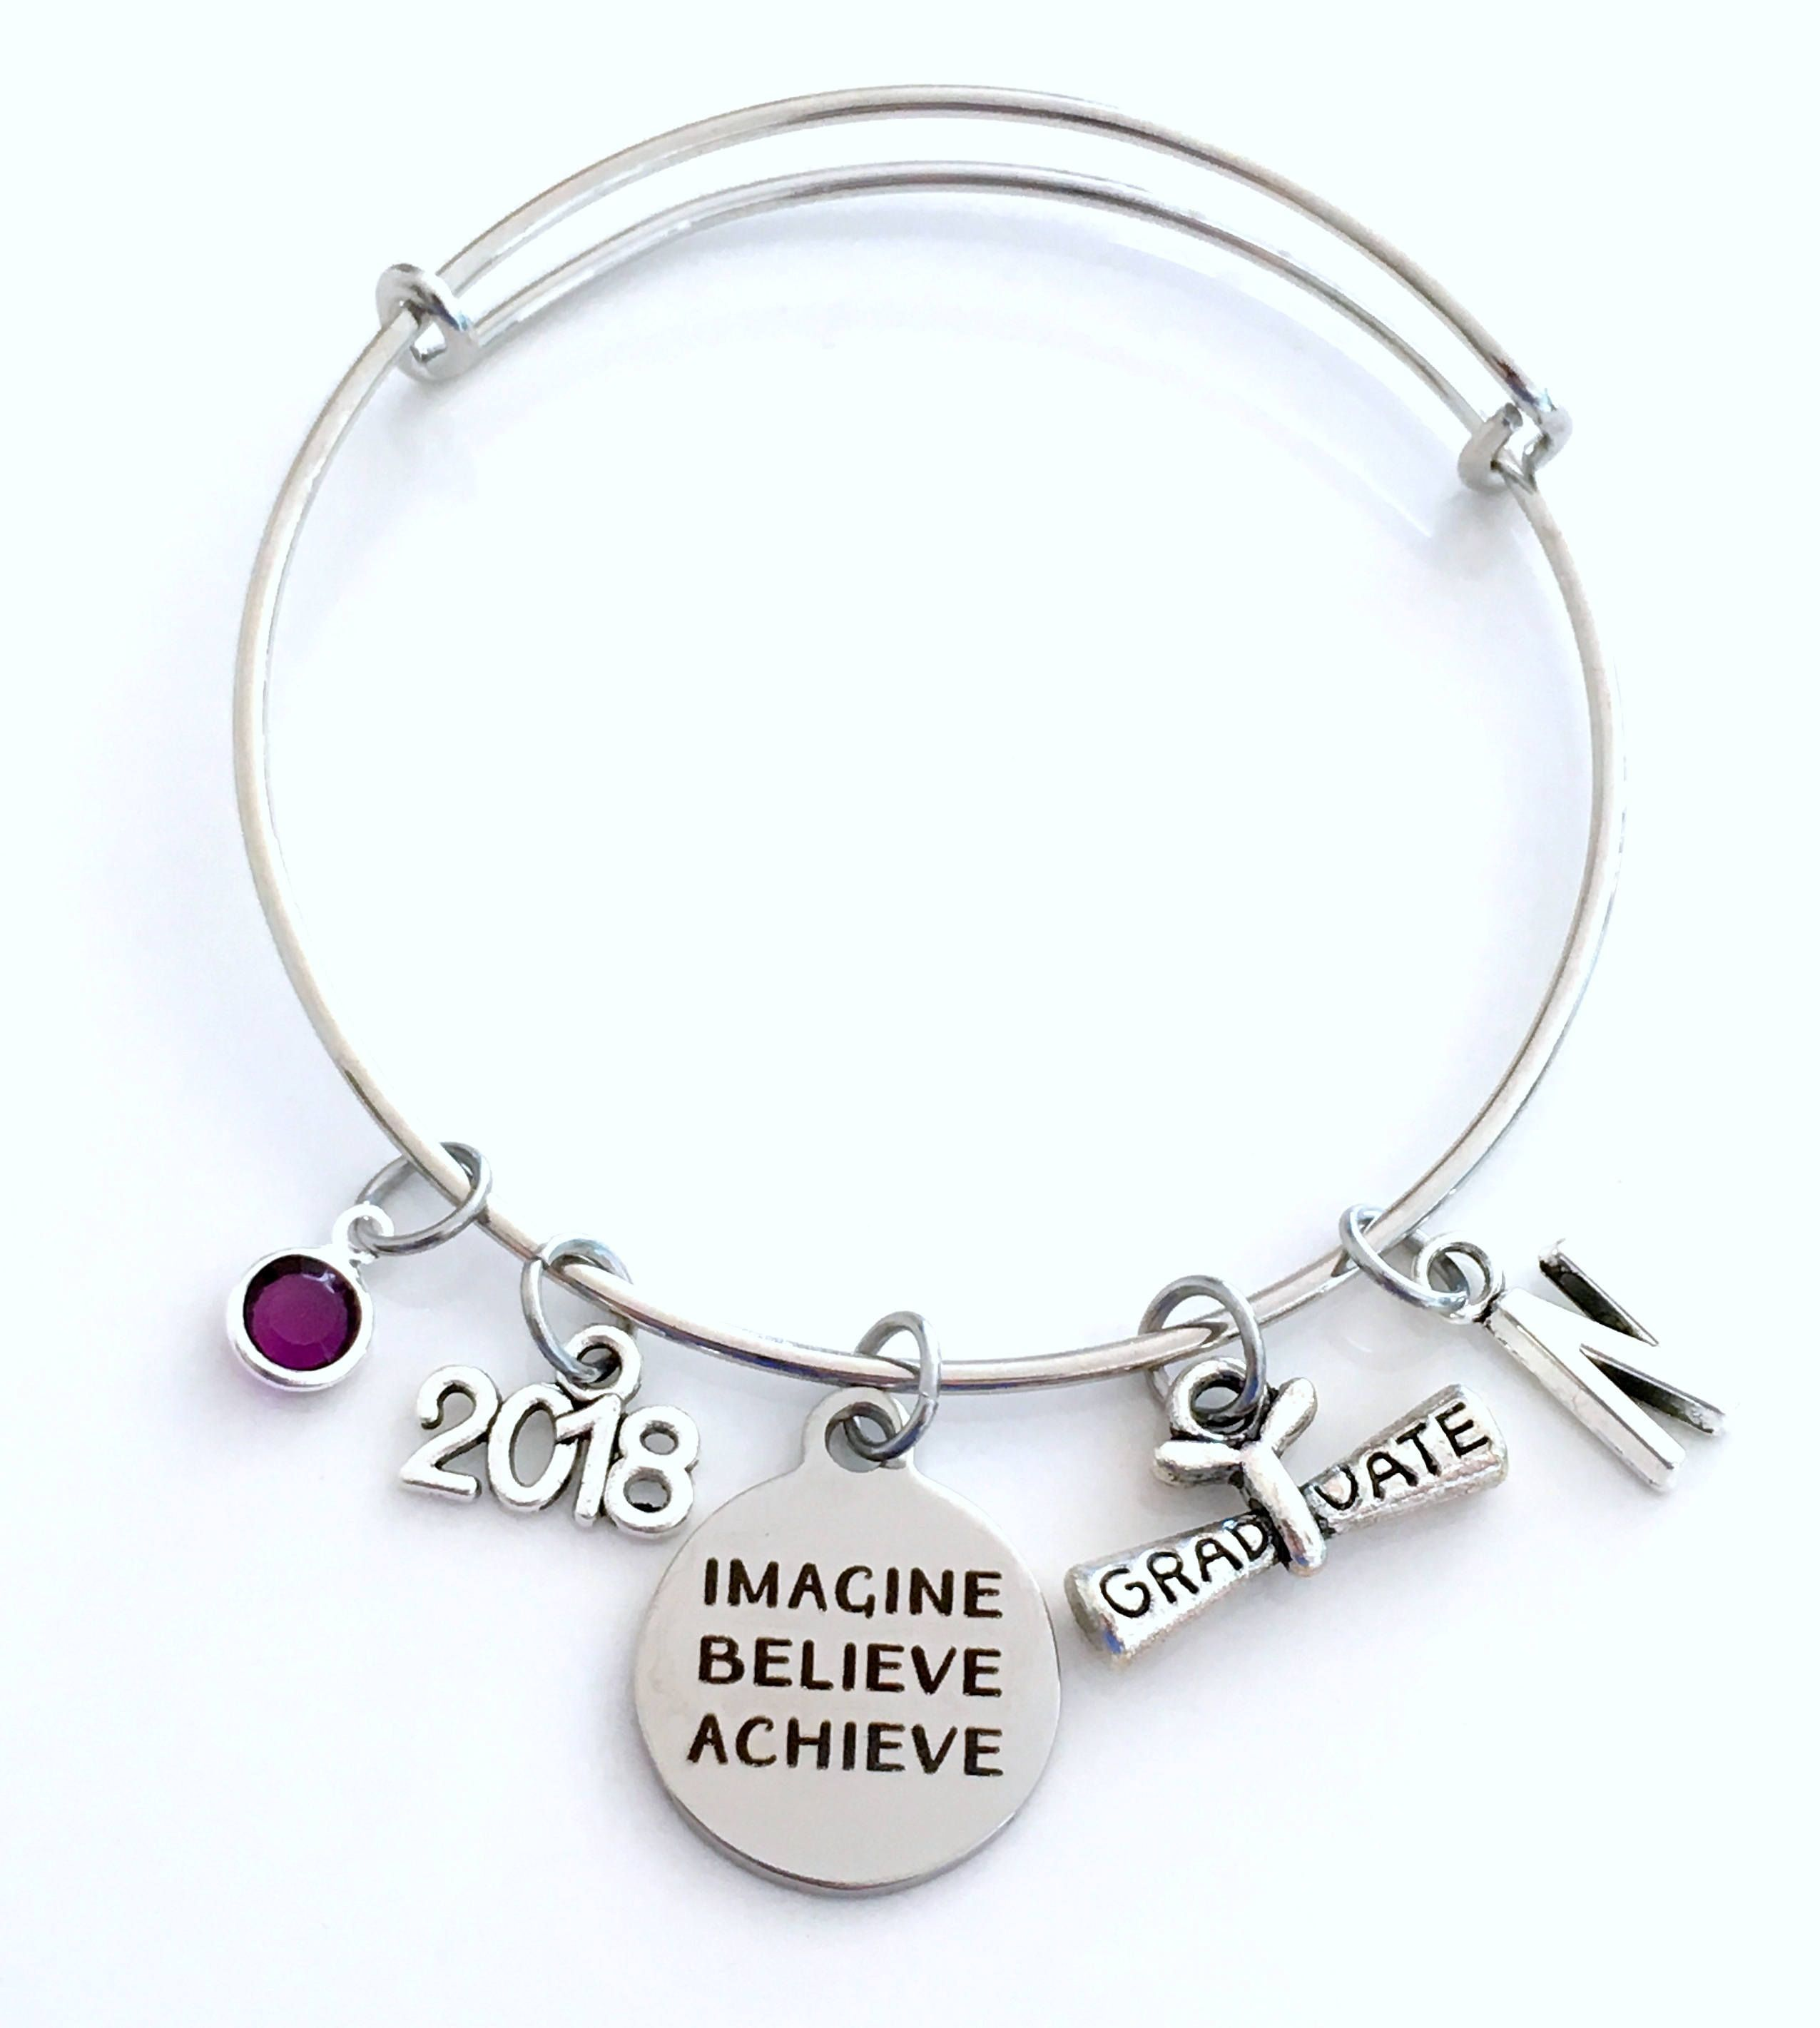 Graduation Gift For Her Bracelet Imagine Believe Achieve Jewelry